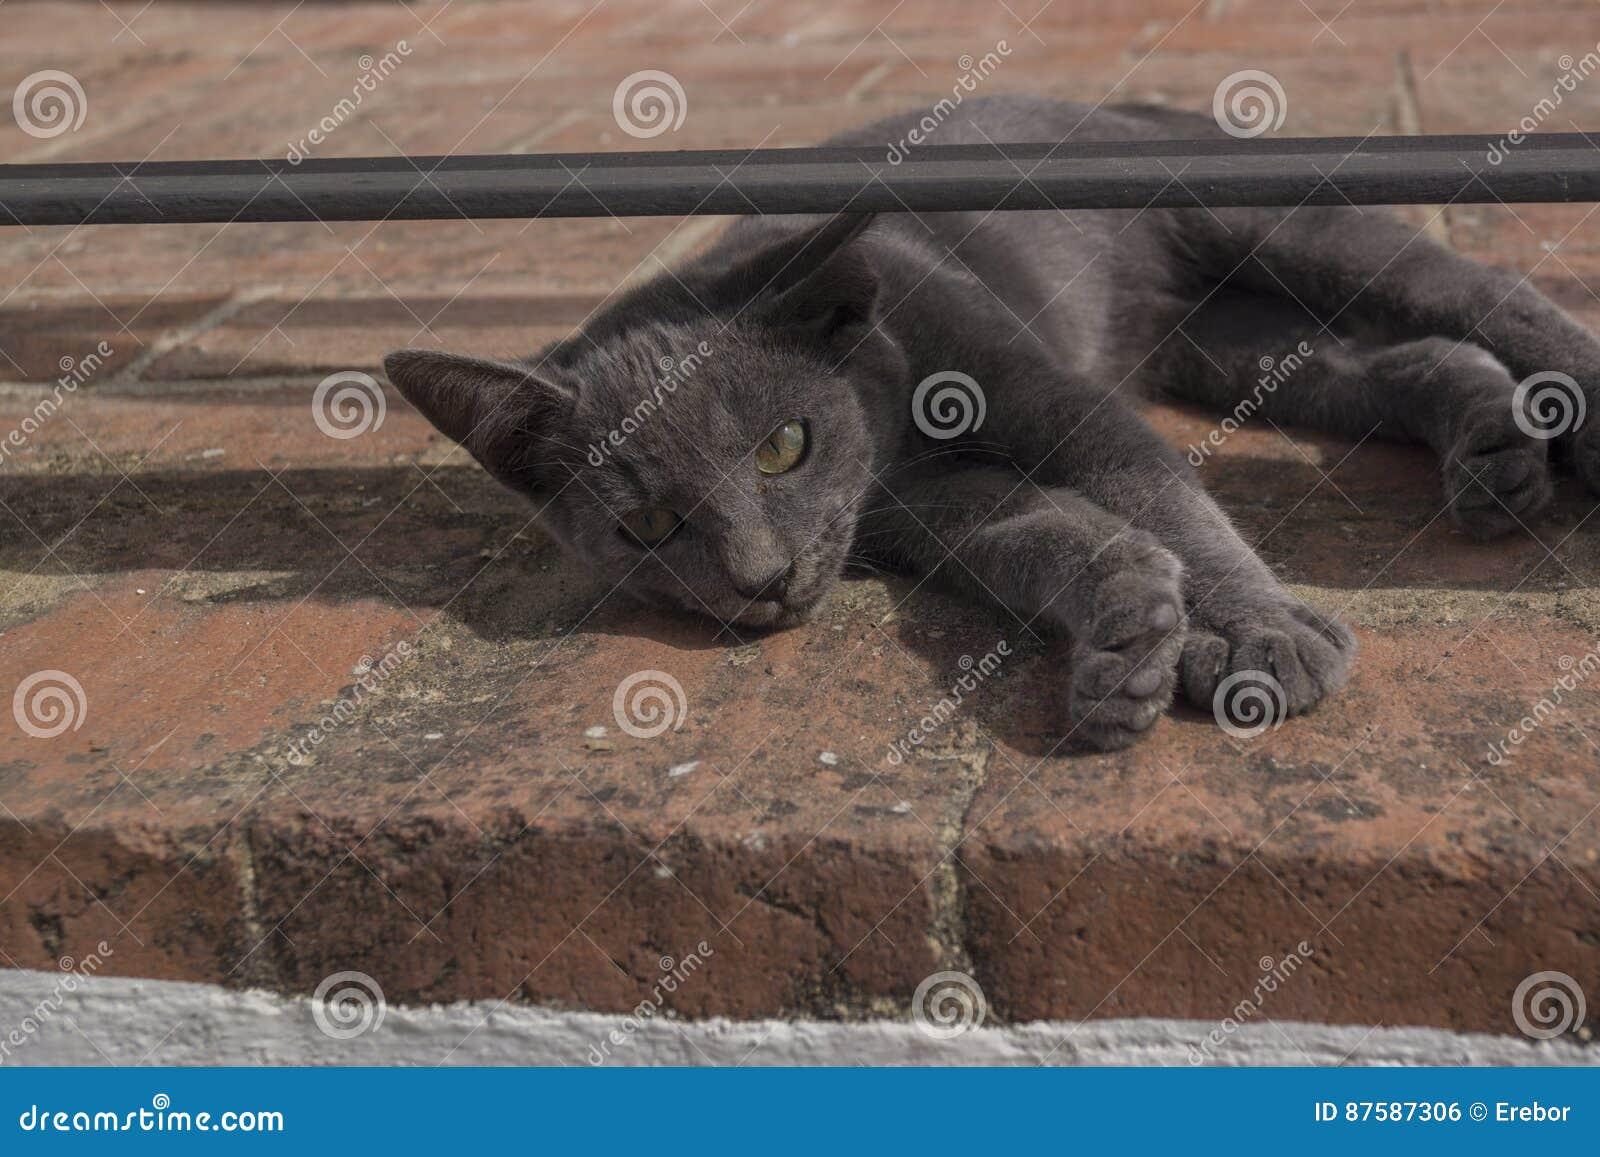 Grey cat lying on street looking into camera